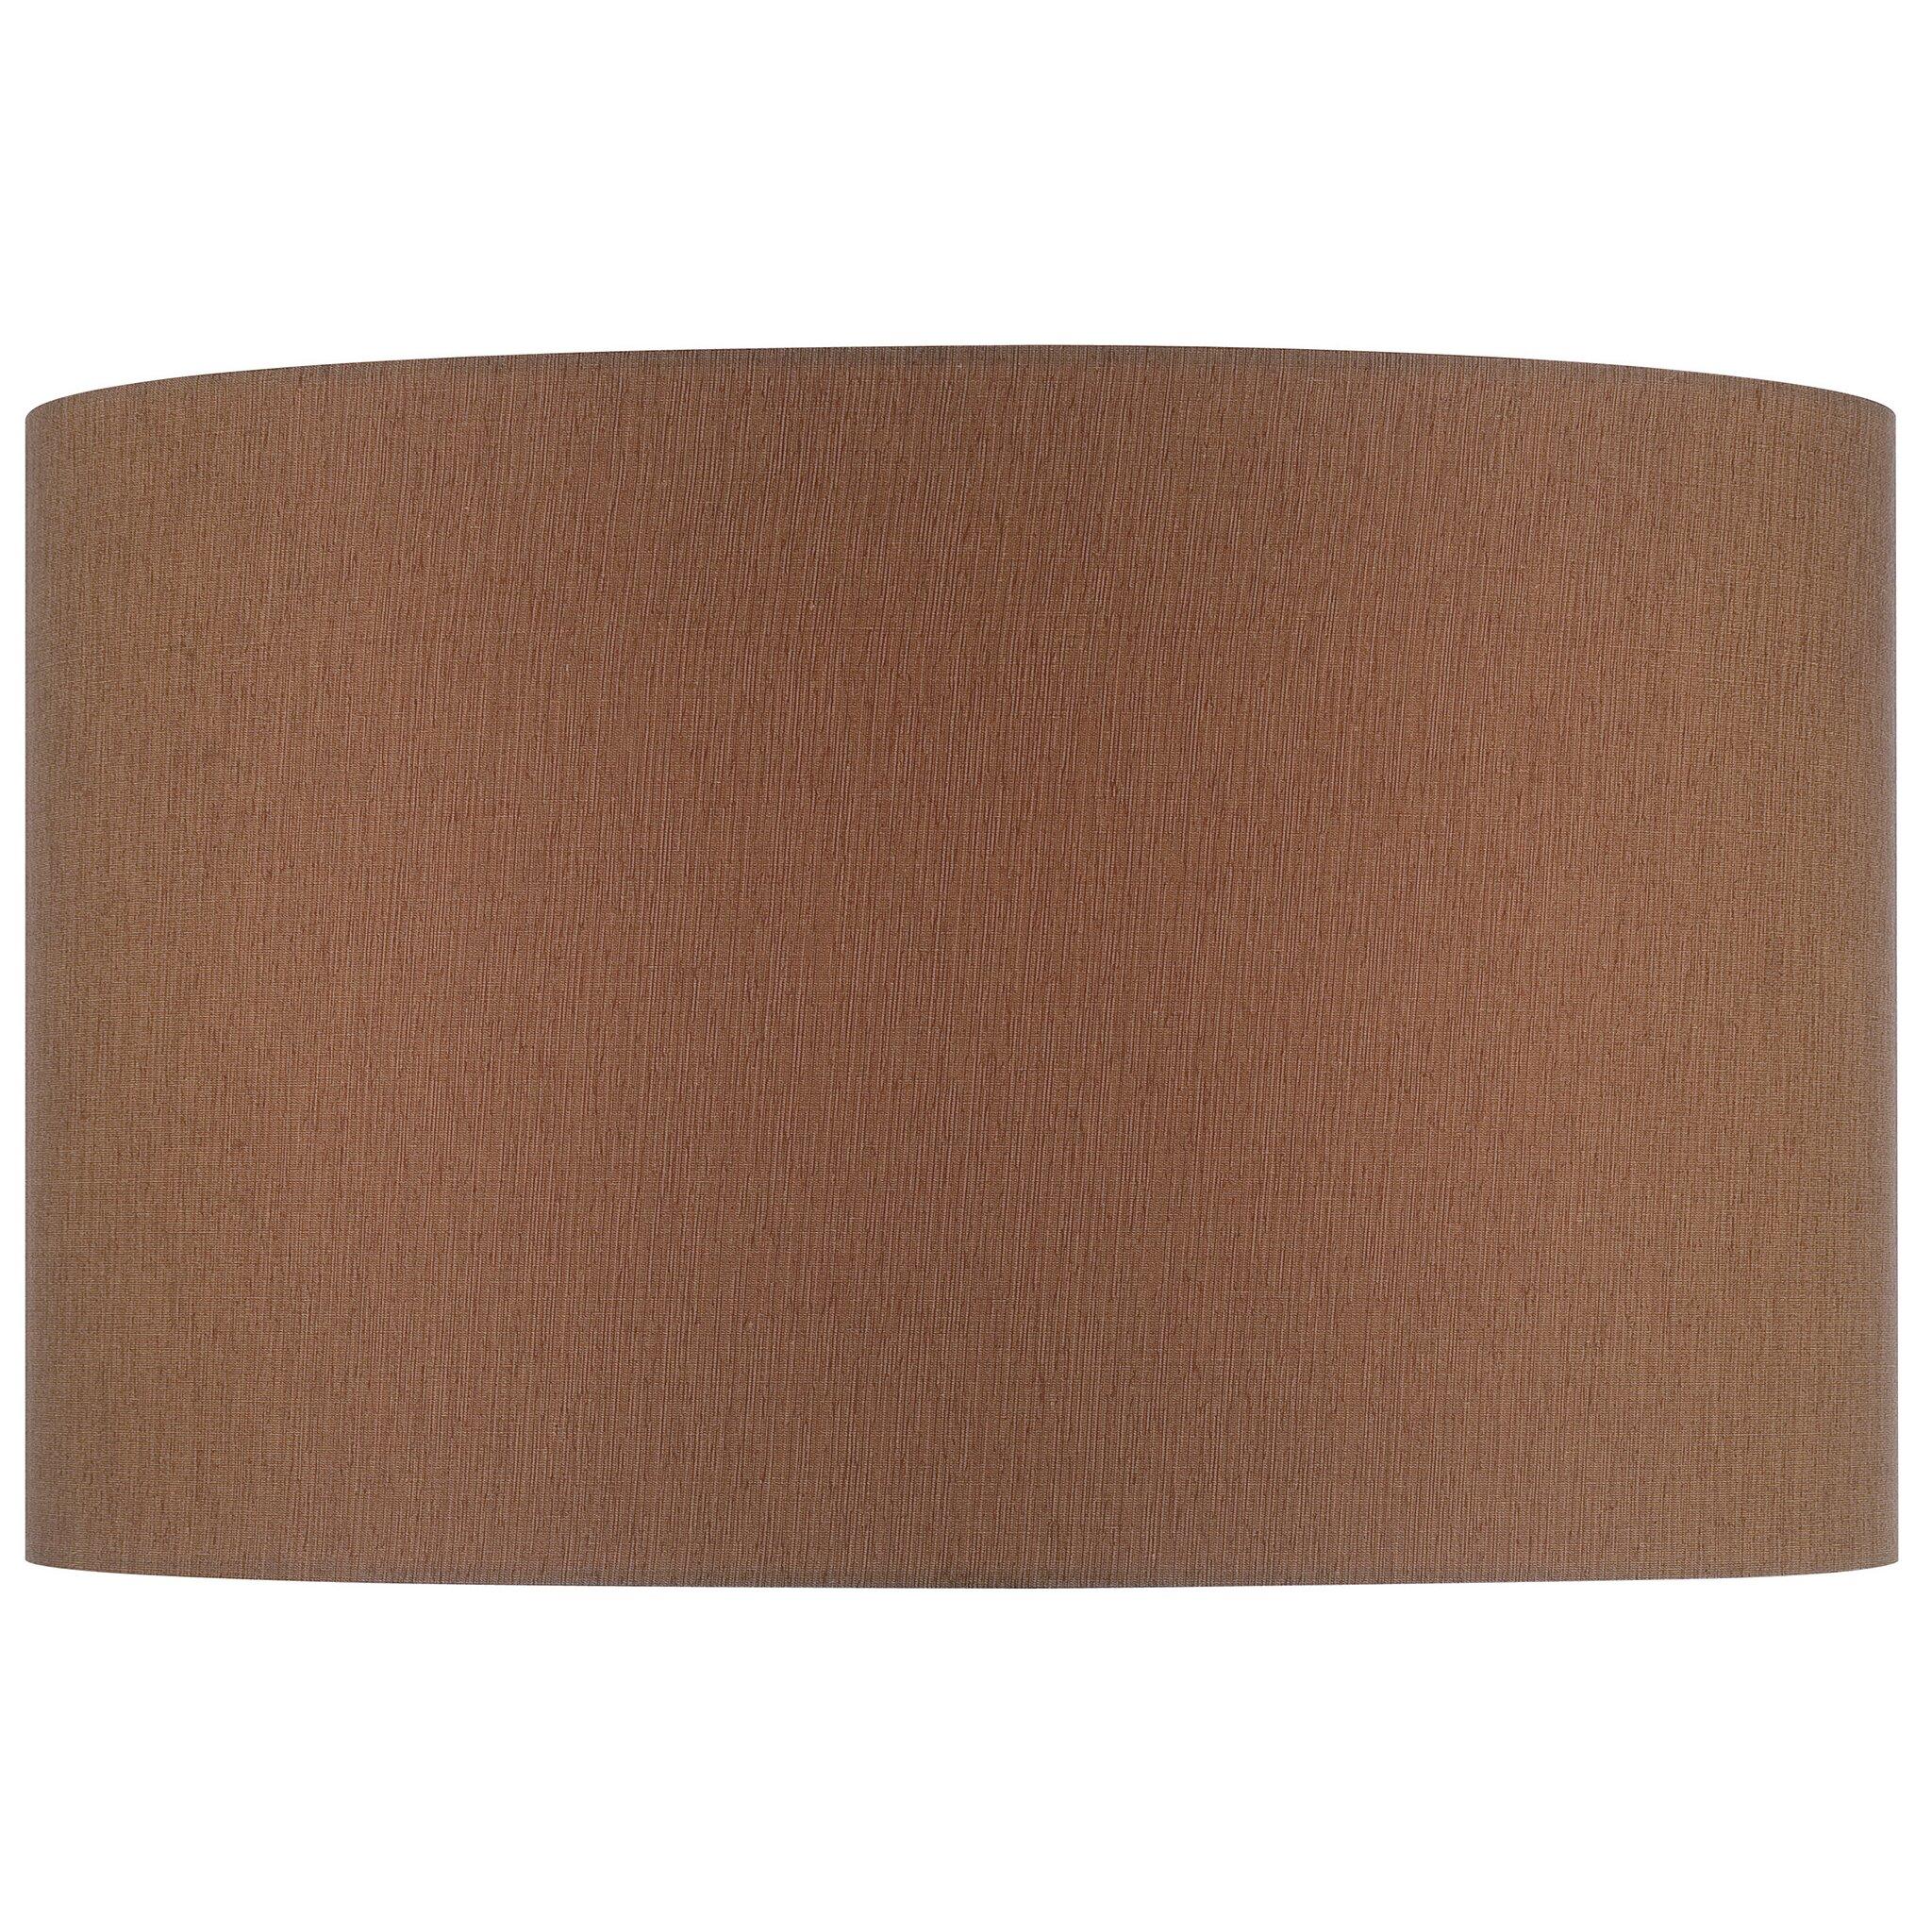 zipcode design 18 drum lamp shade reviews wayfair. Black Bedroom Furniture Sets. Home Design Ideas